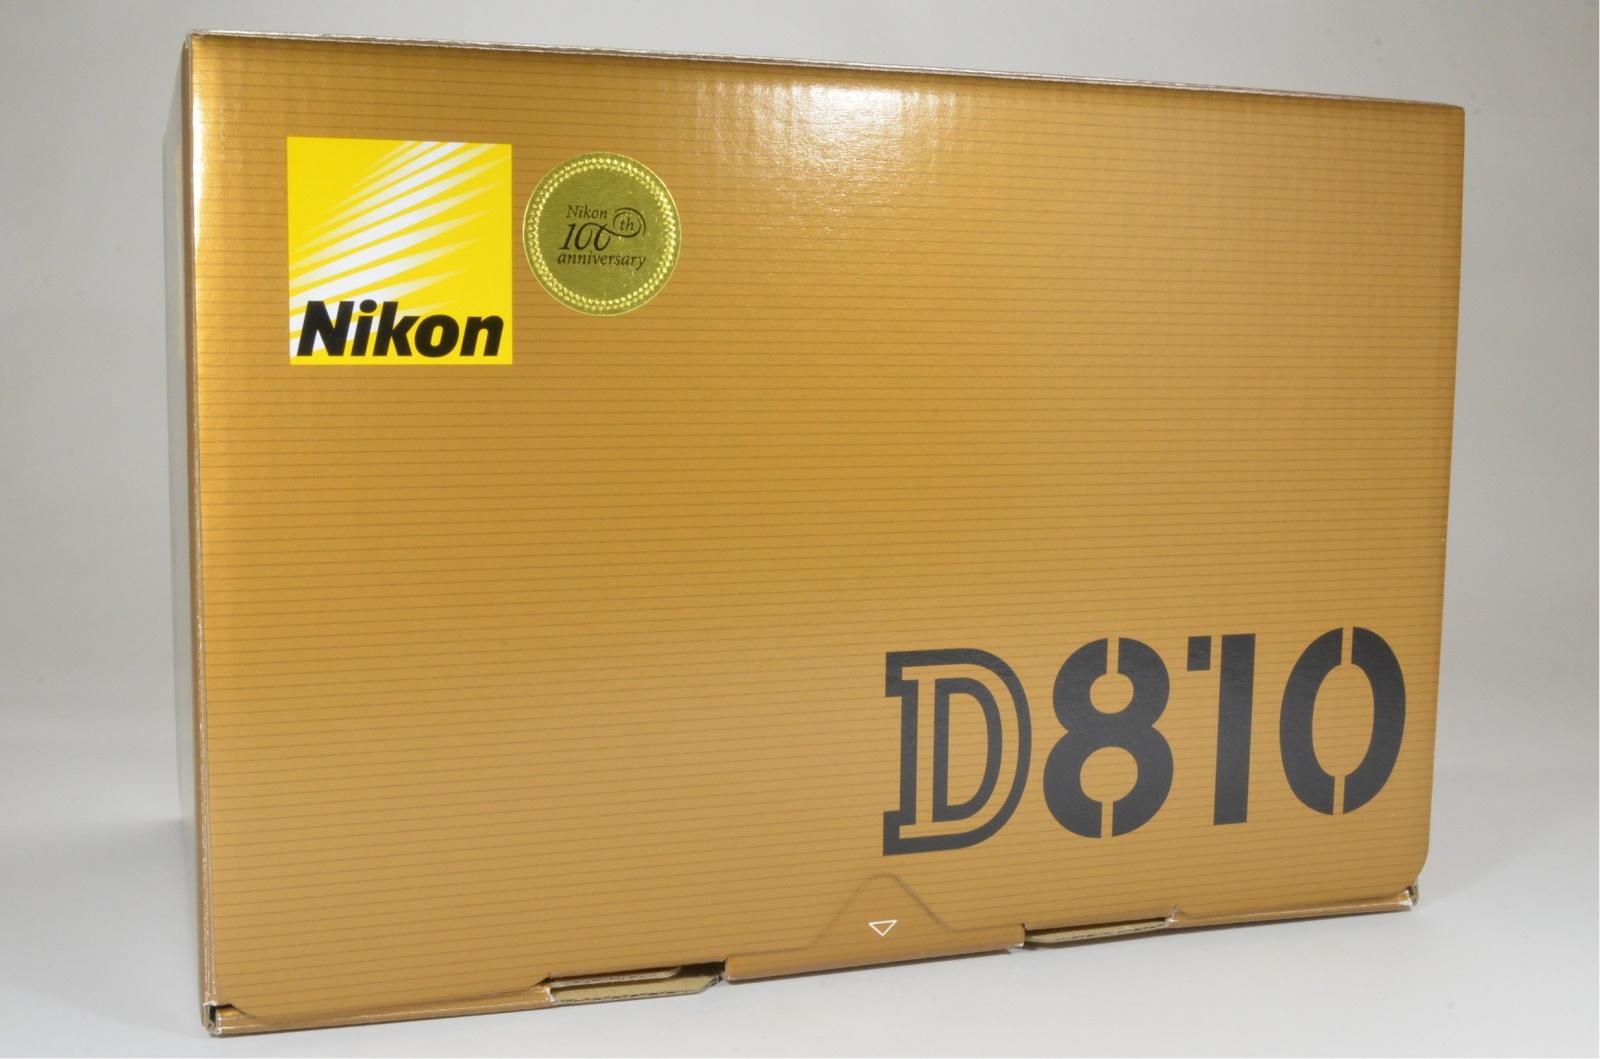 nikon d810 36.3mp digital slr camera body shutter count 8437 from japan